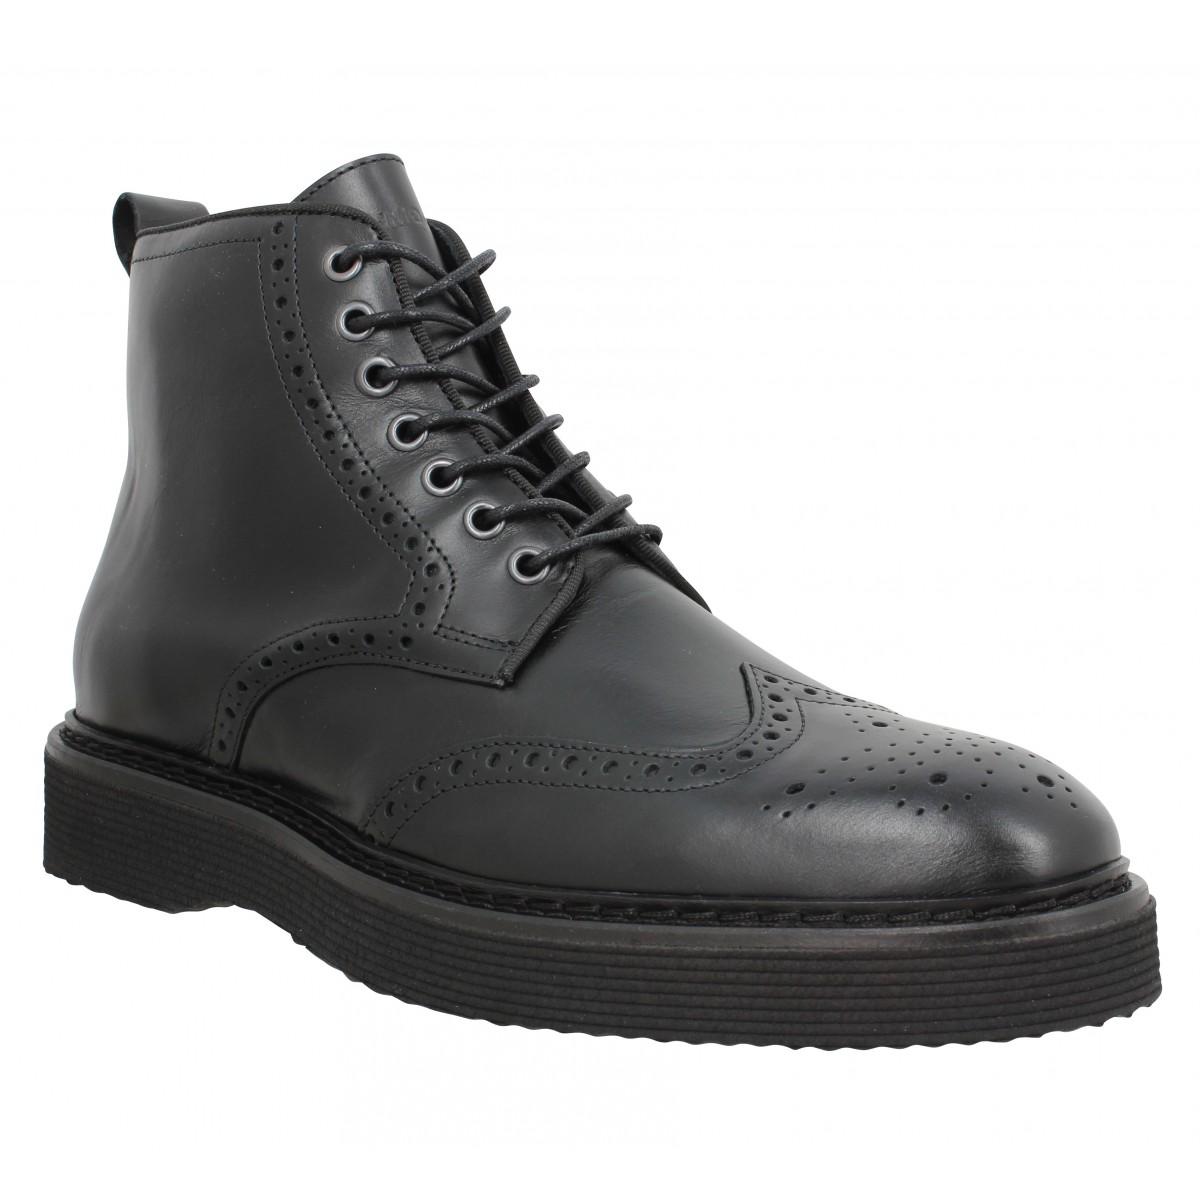 Bottines SCHMOOVE Roma Boots cuir Homme Noir